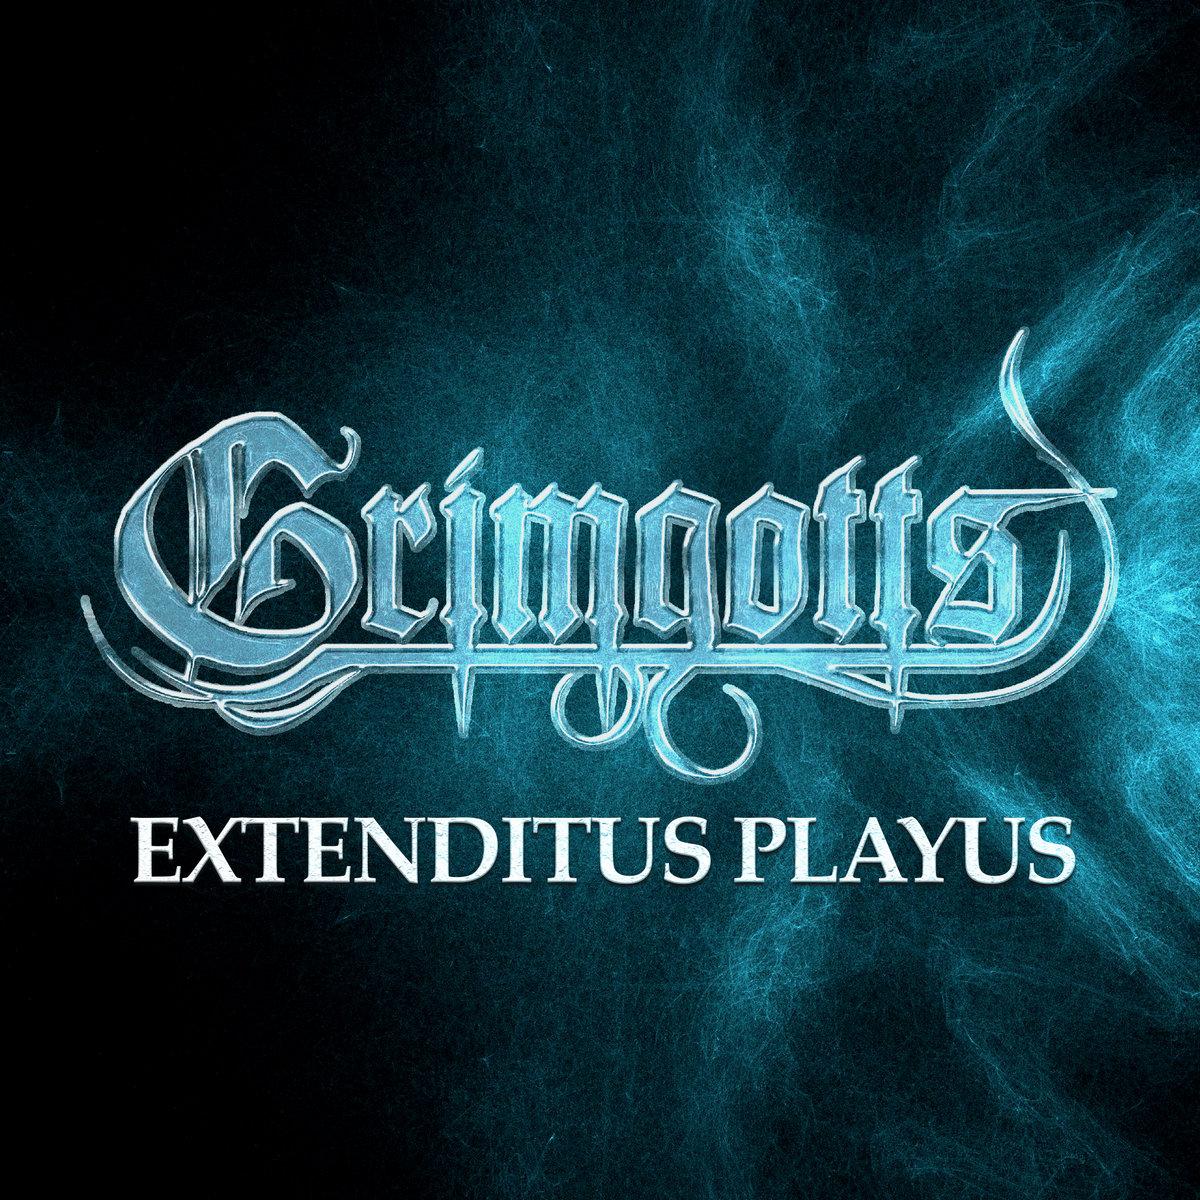 http://grimgotts.bandcamp.com/album/extenditus-playus